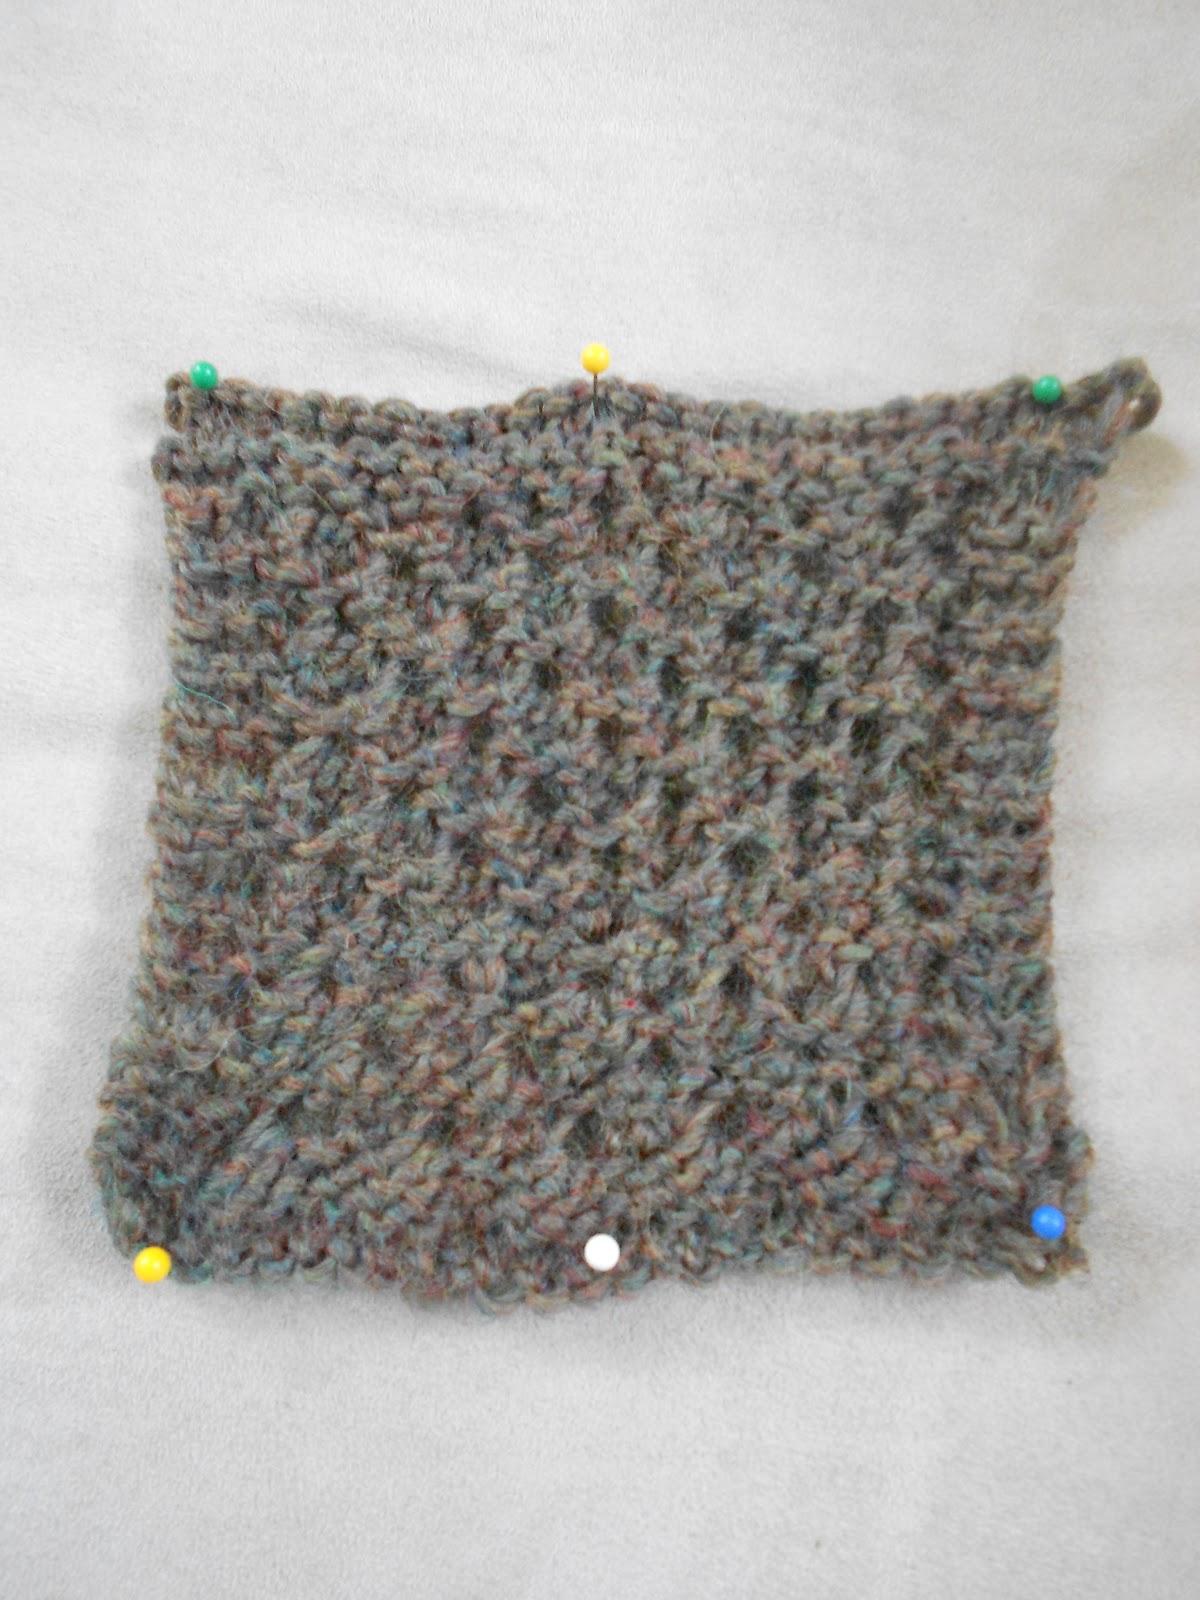 Knitting Raspberry Stitch In The Round : Blue Betty: Stitch Guide: Raspberry Stitch